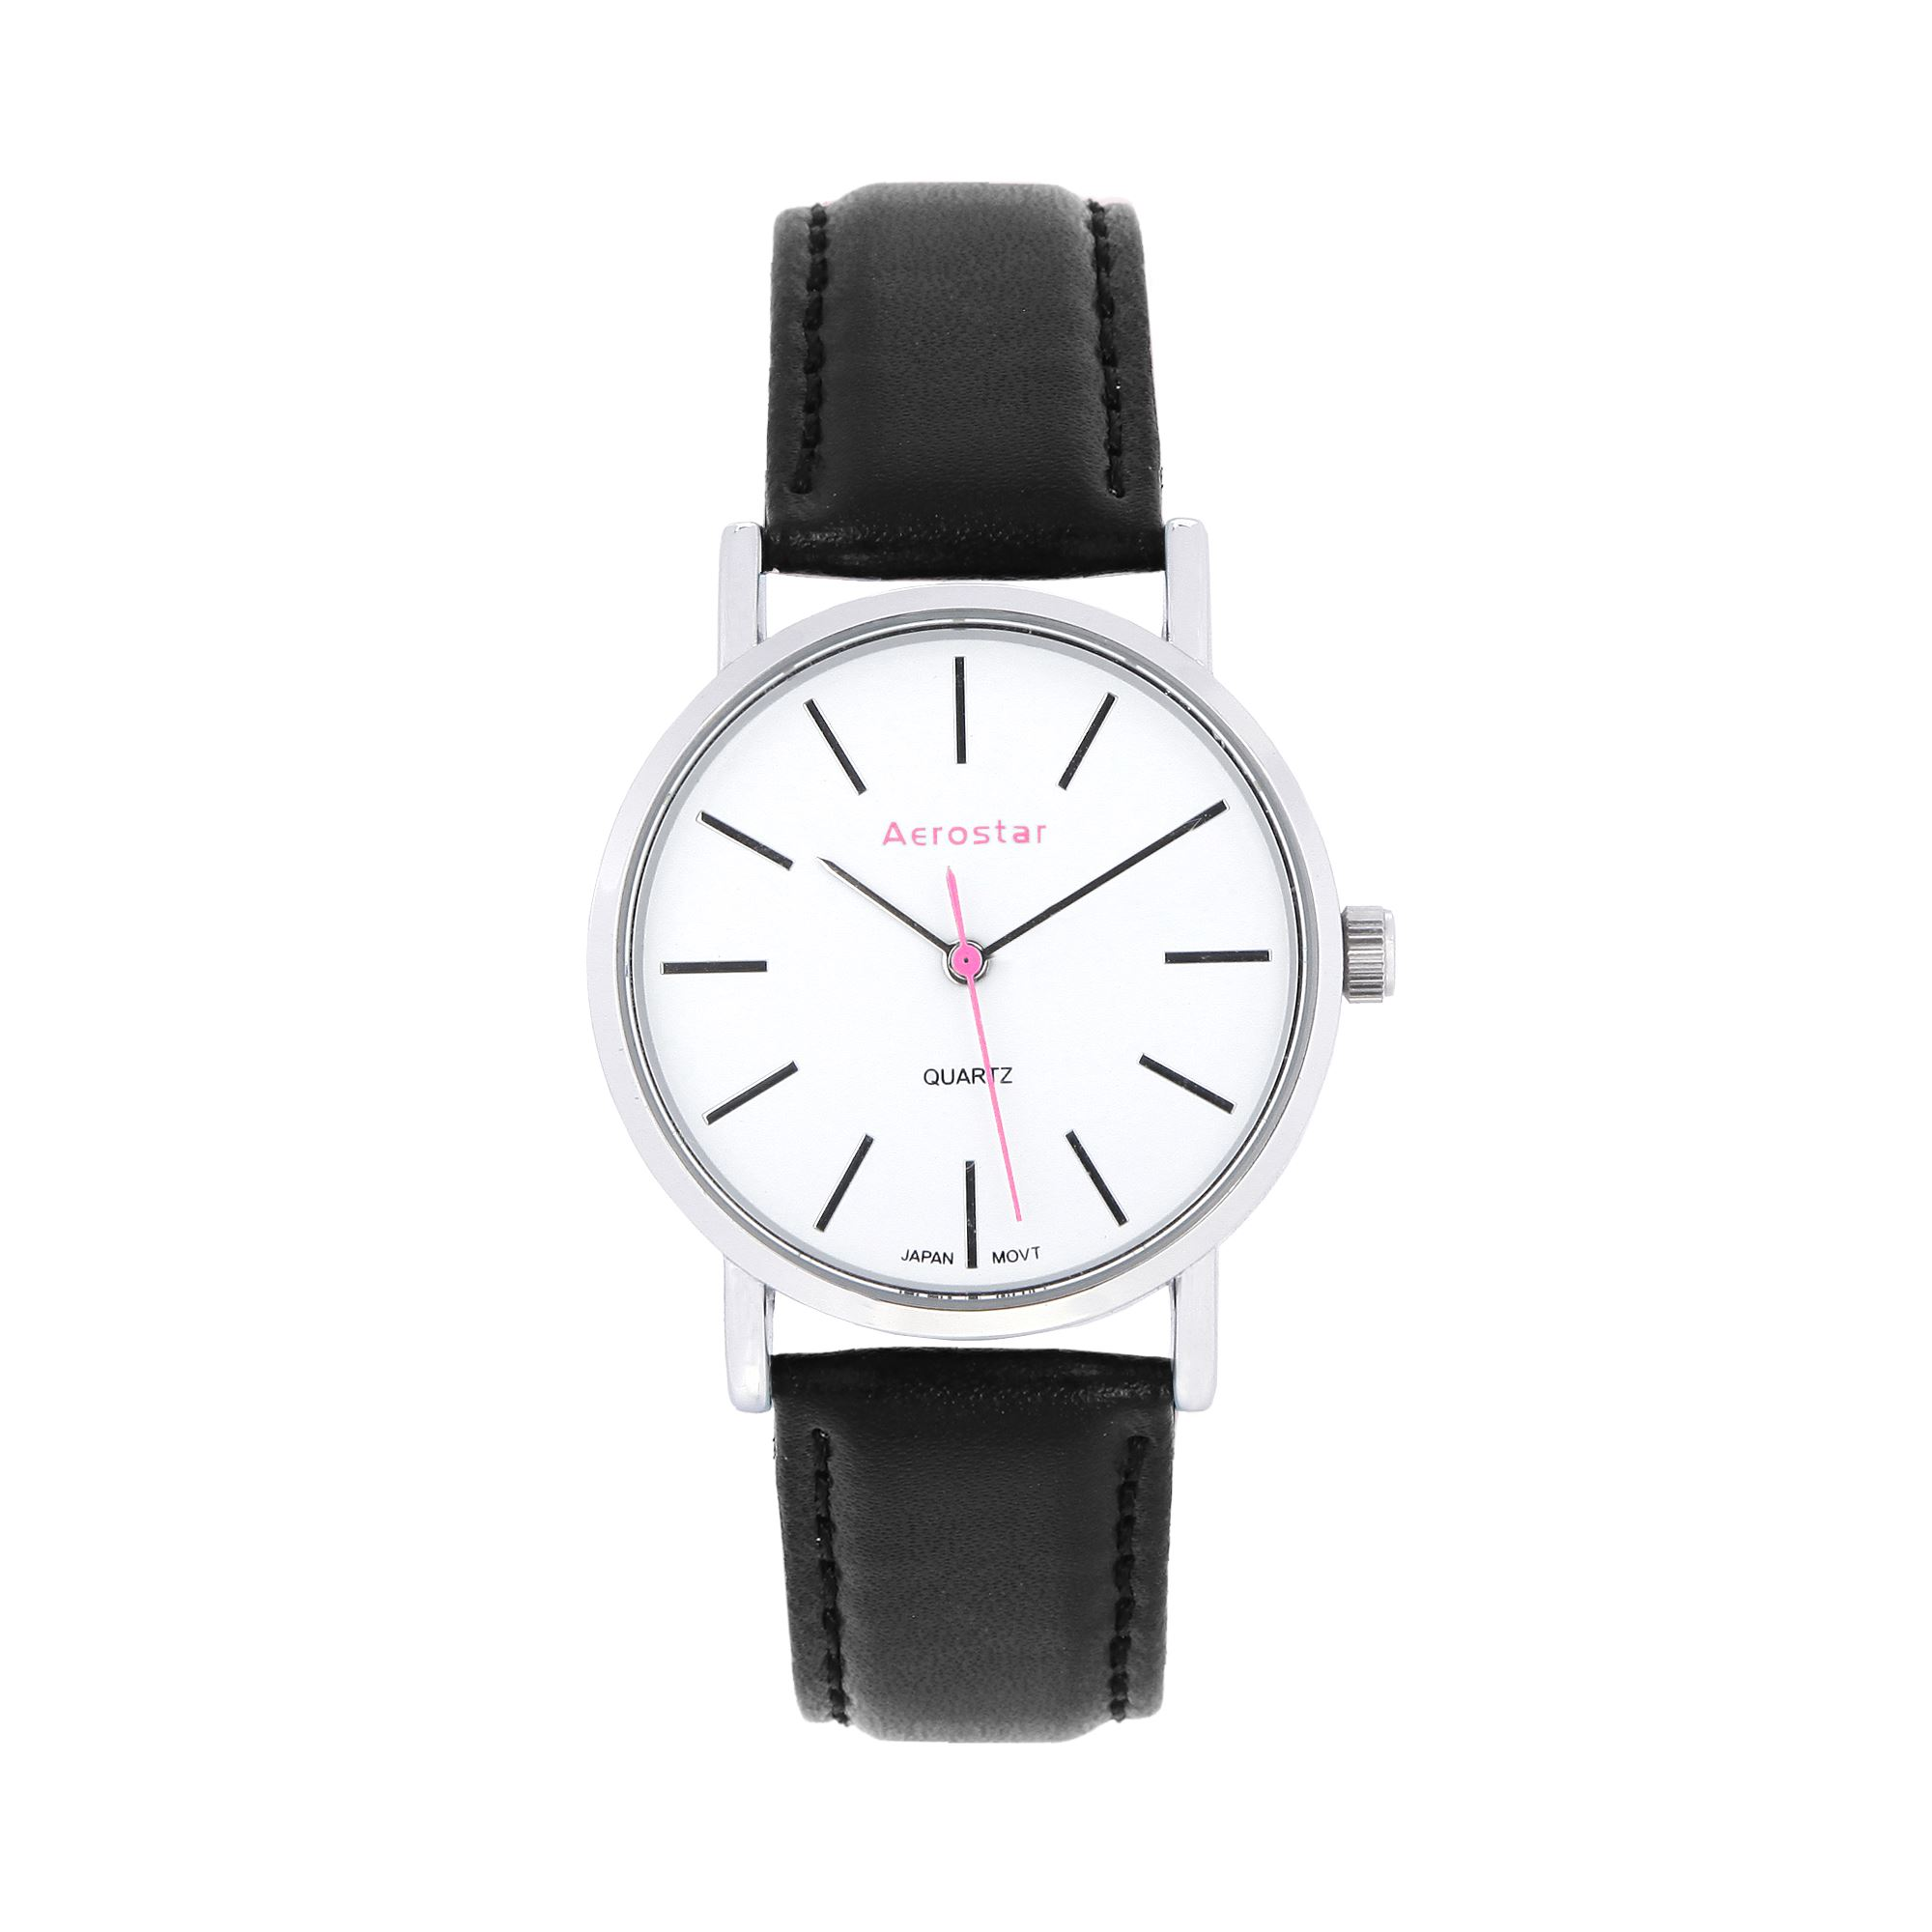 Aerostar - Reloj Dama 6611001 negro  286f22d8145f